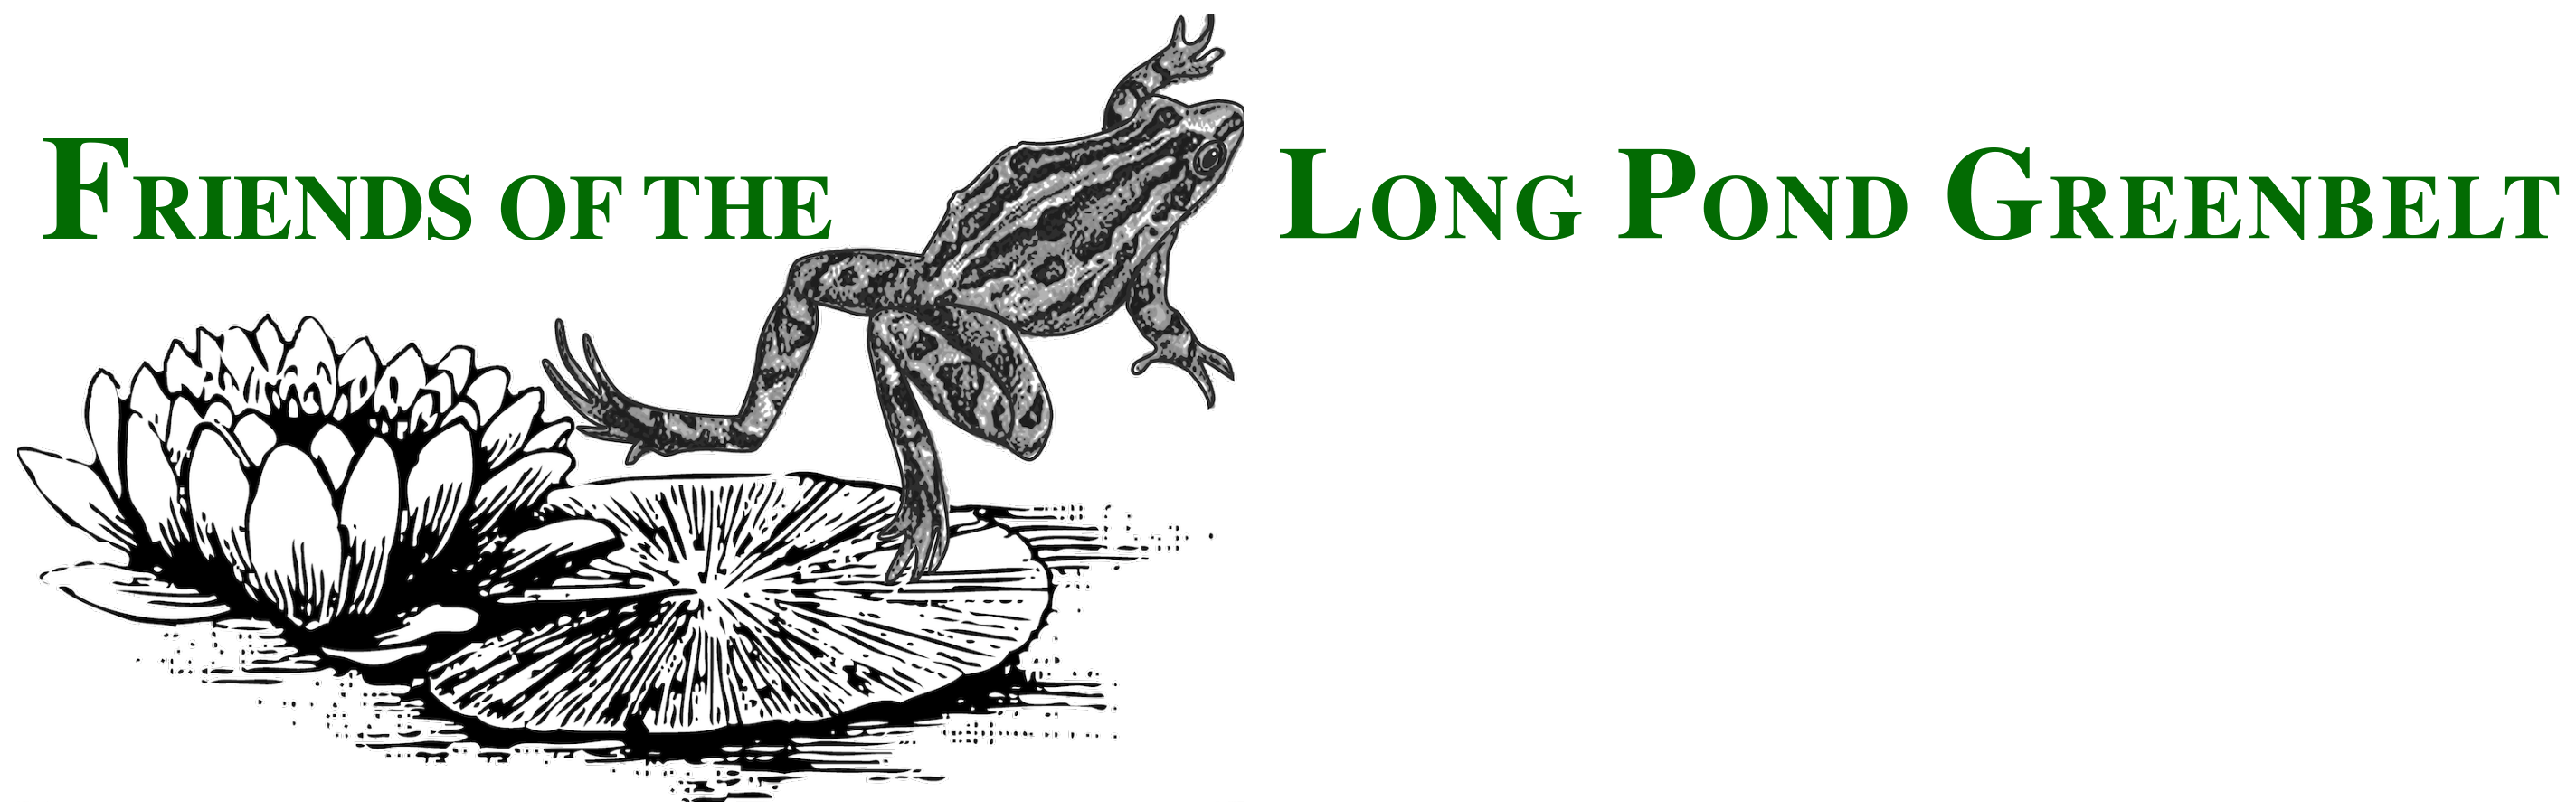 longpondgreenbelt.com